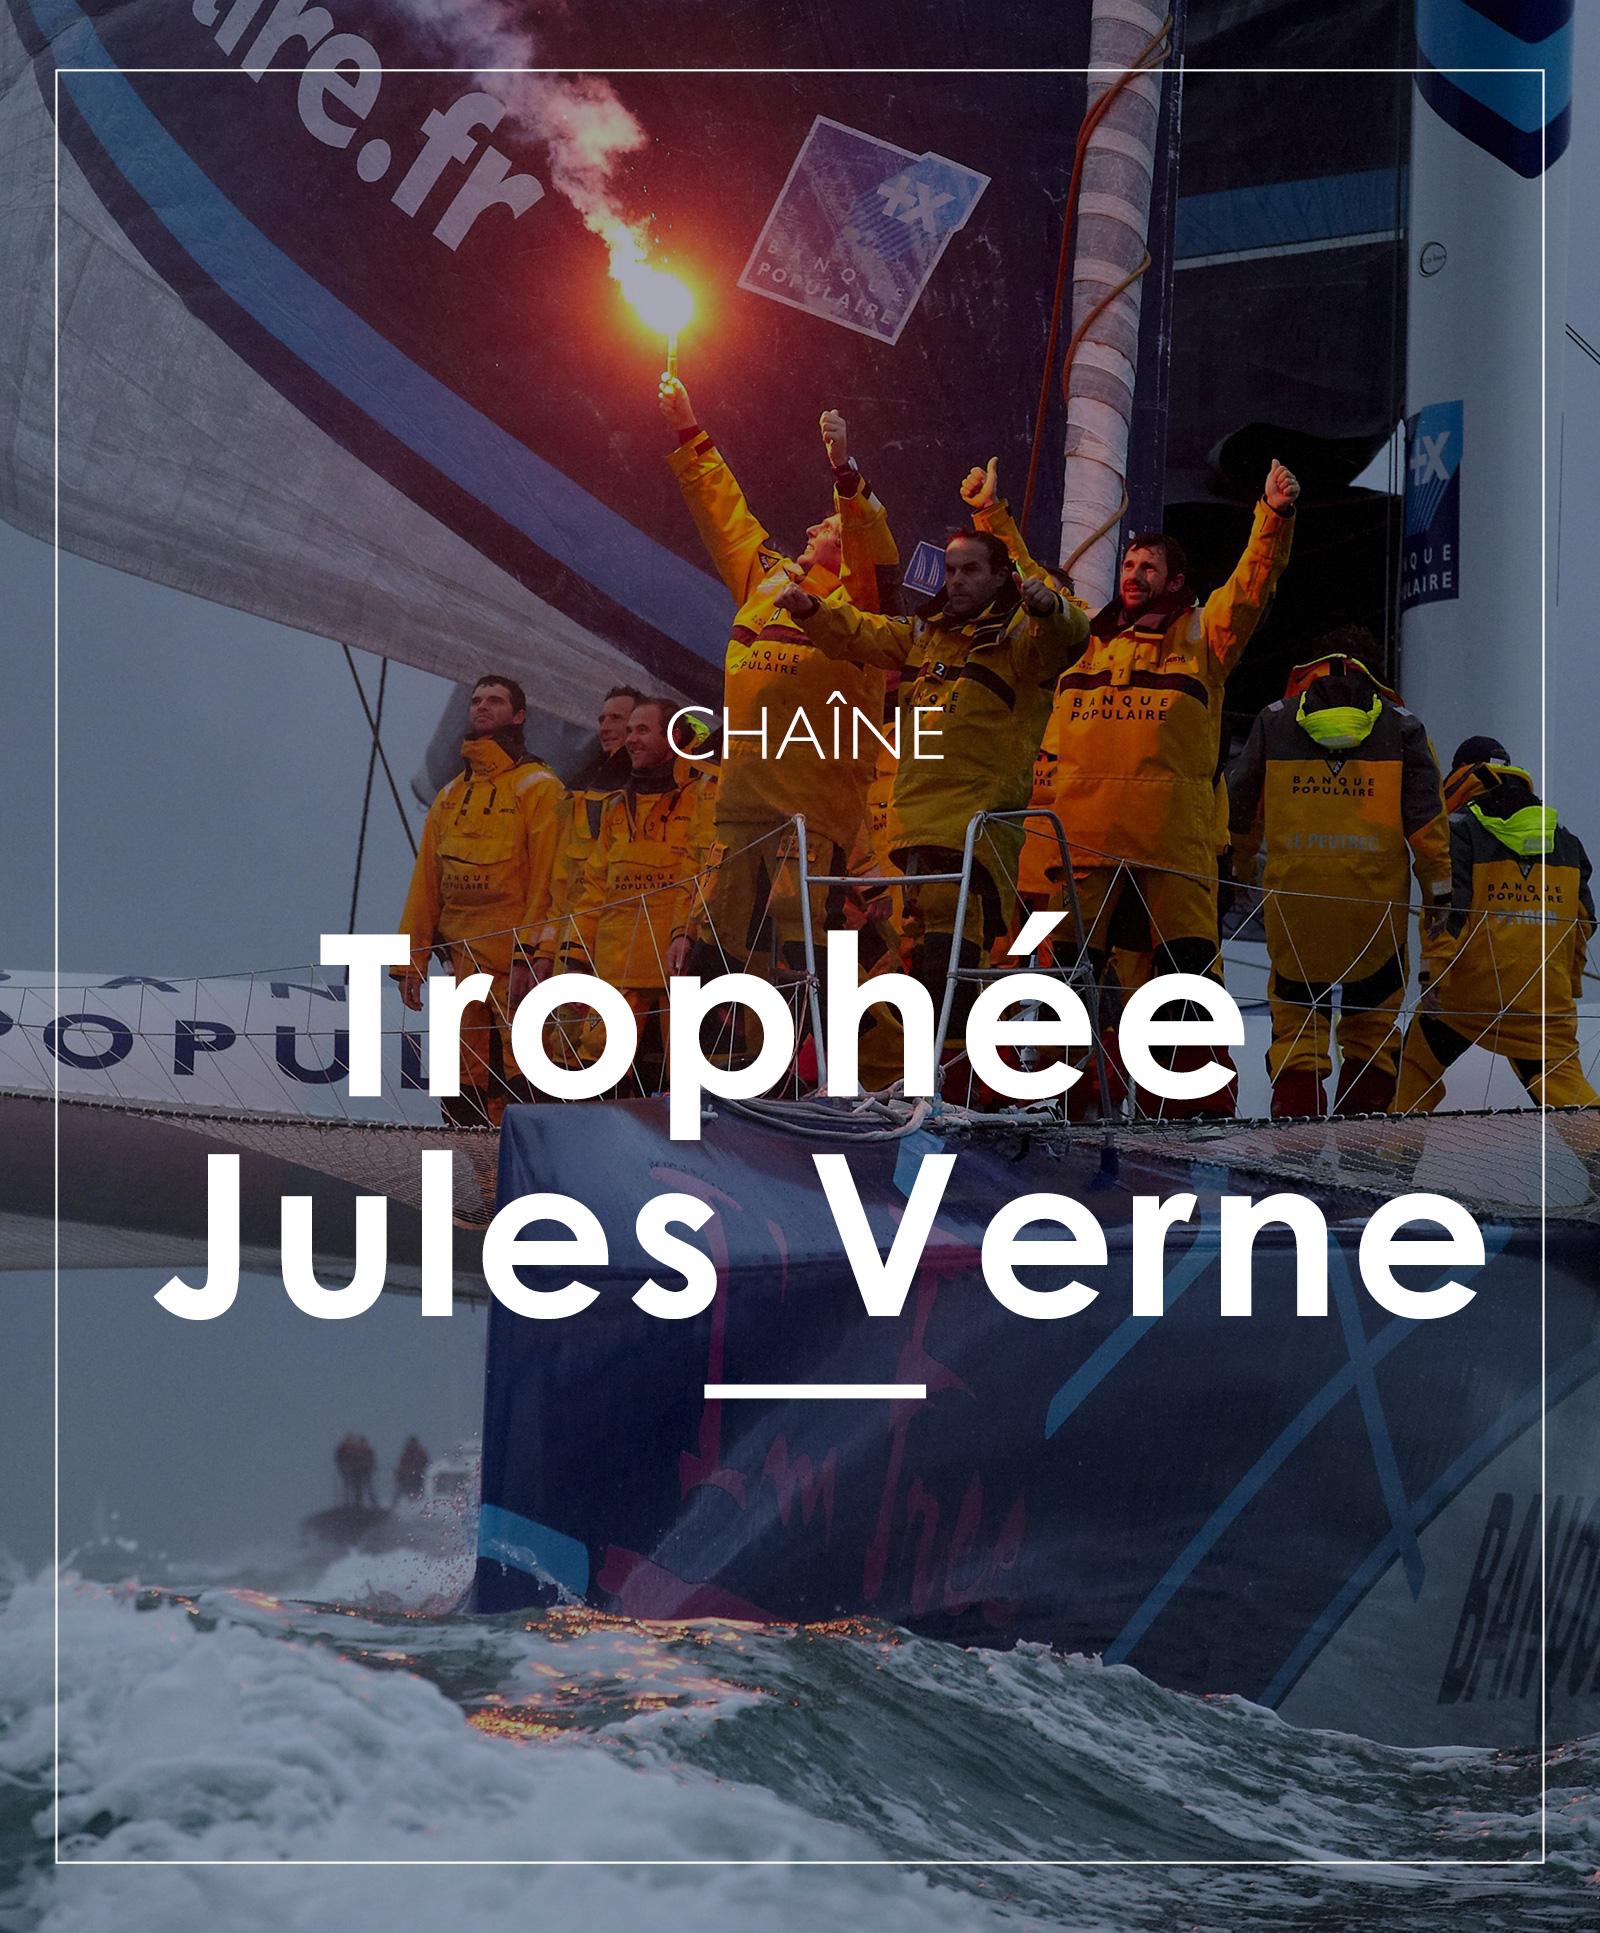 chaine TROPHEE JULES VERNE